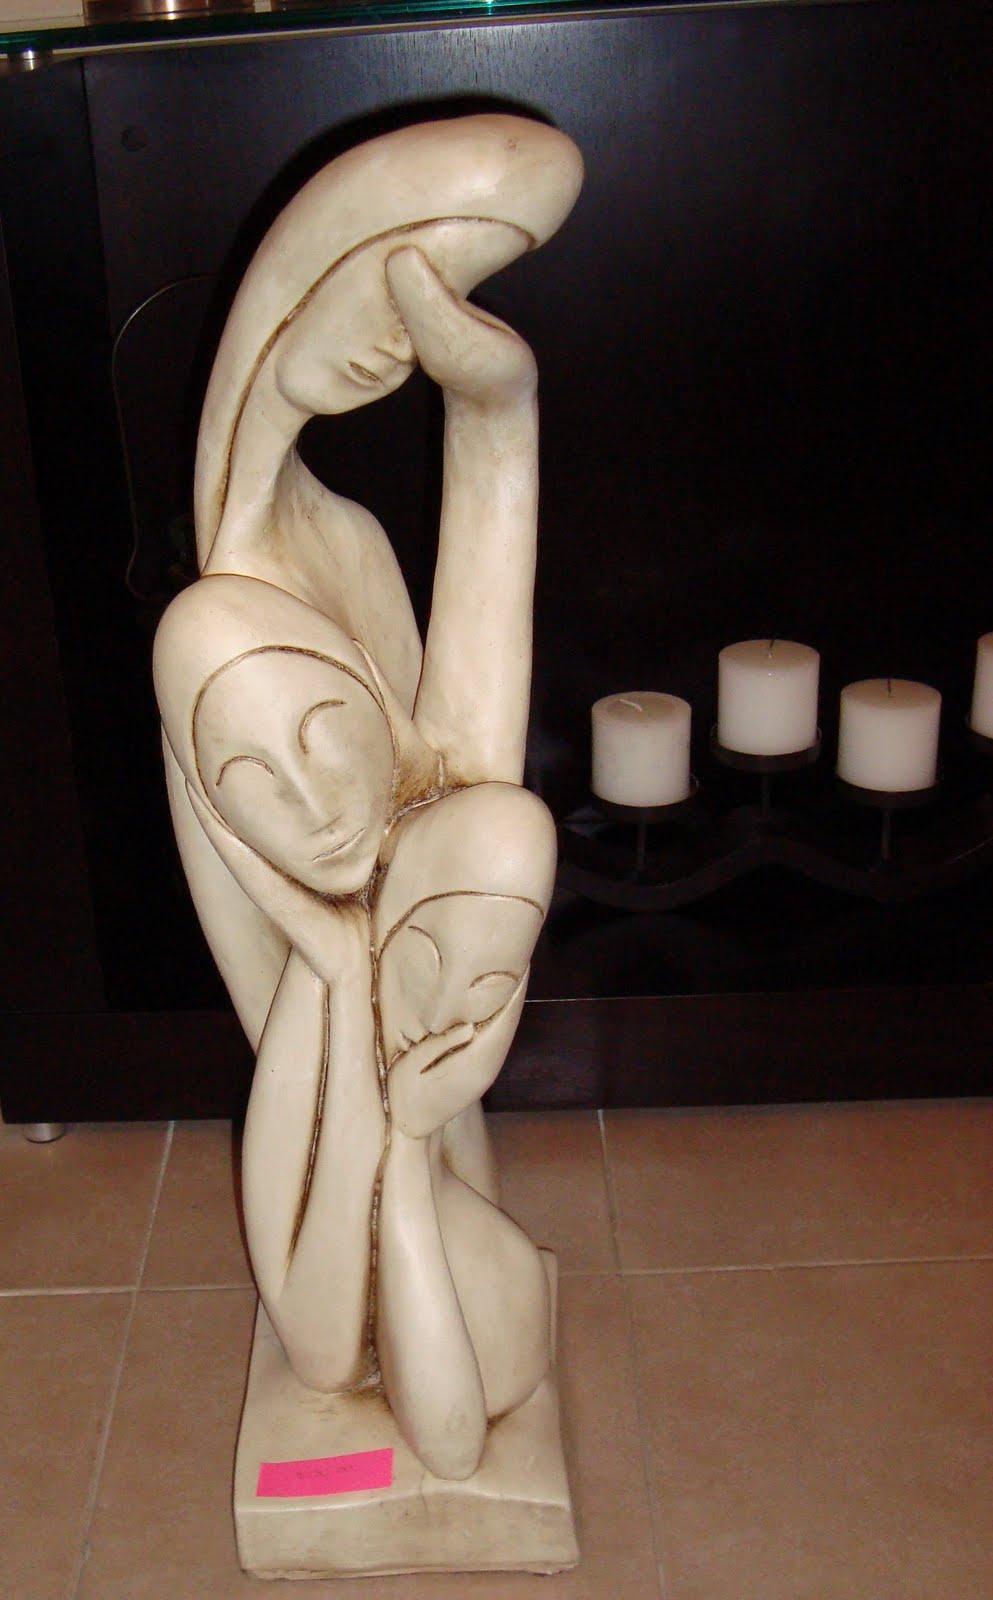 Decoracion artesanal escultura mujeres - Esculturas decoracion ...